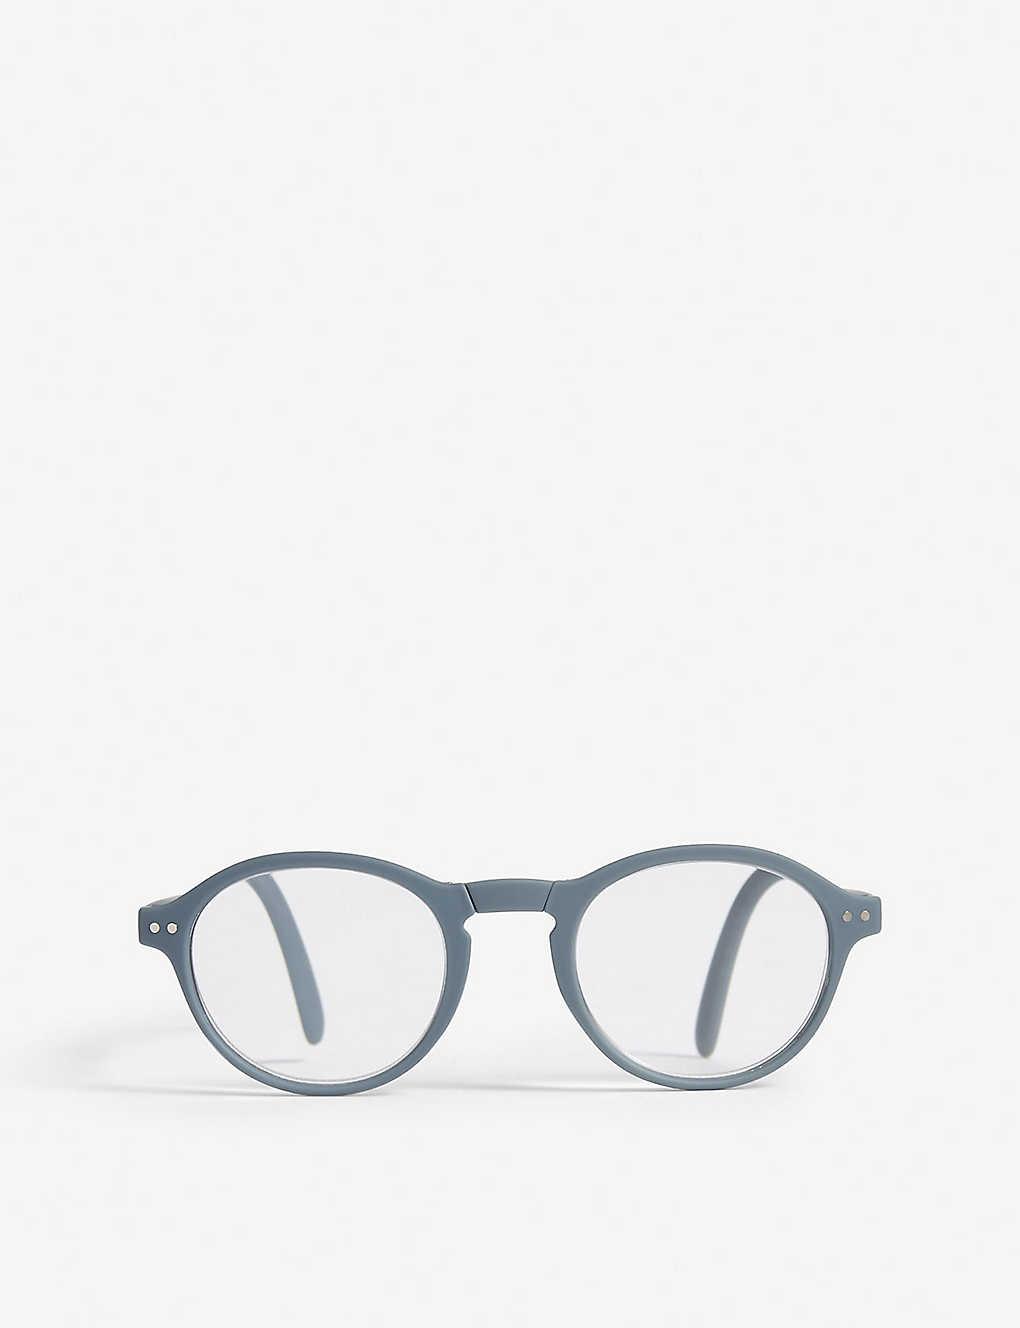 3a13d38b48 IZIPIZI - Letmesee  F round-frame foldable reading glasses +2.5 ...